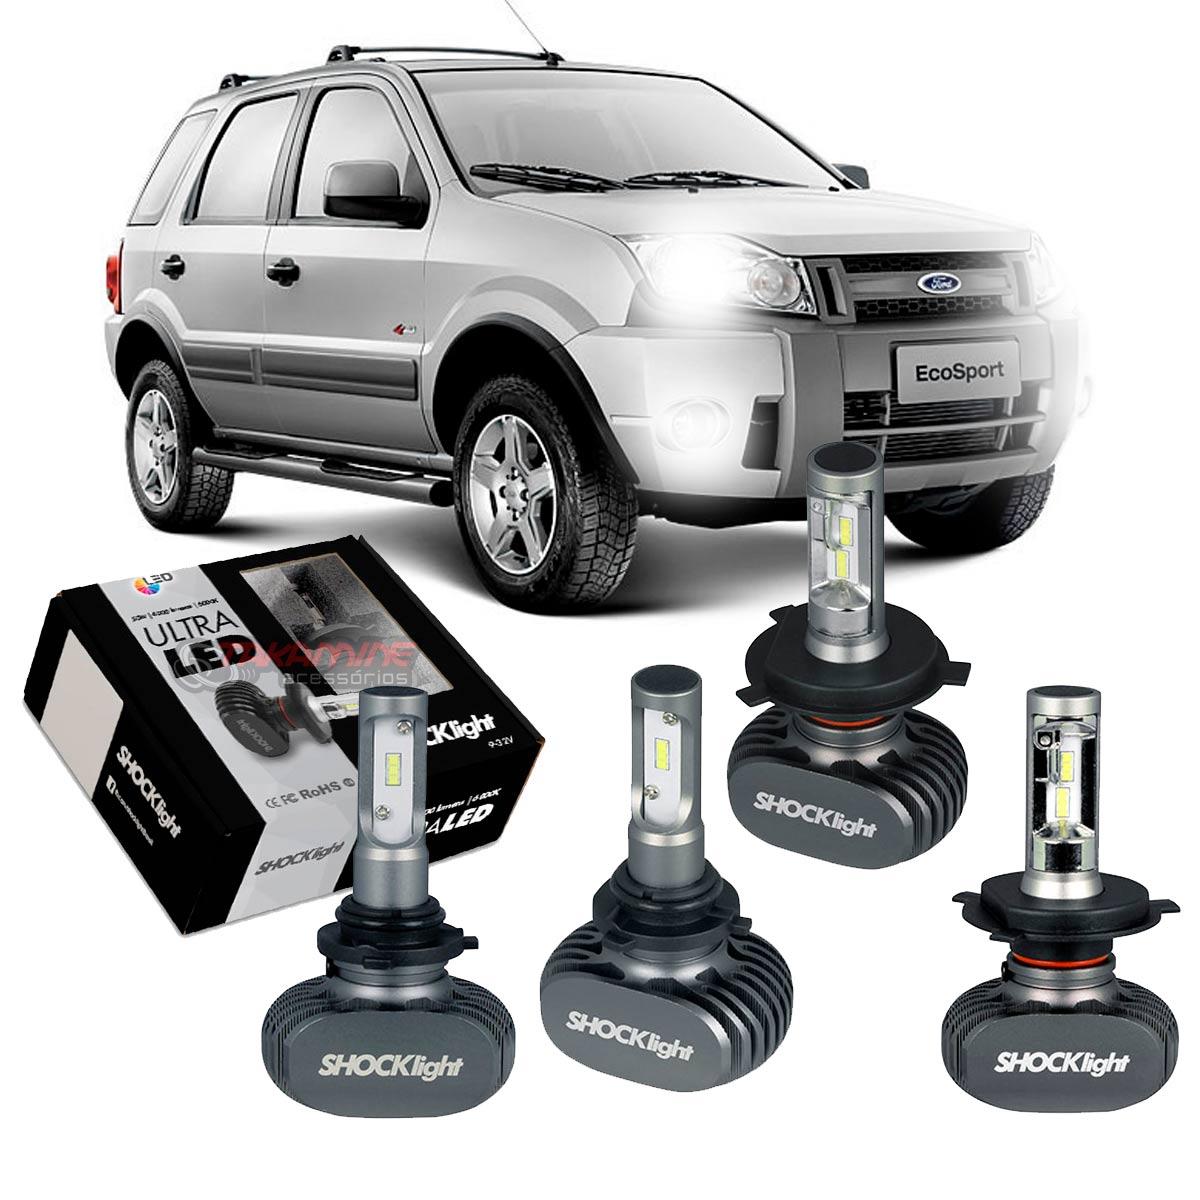 Kit Ultra LED Ecosport 2008 2009 2010 2011 2012 tipo xenon farol alto e baixo H4 e milha HB4